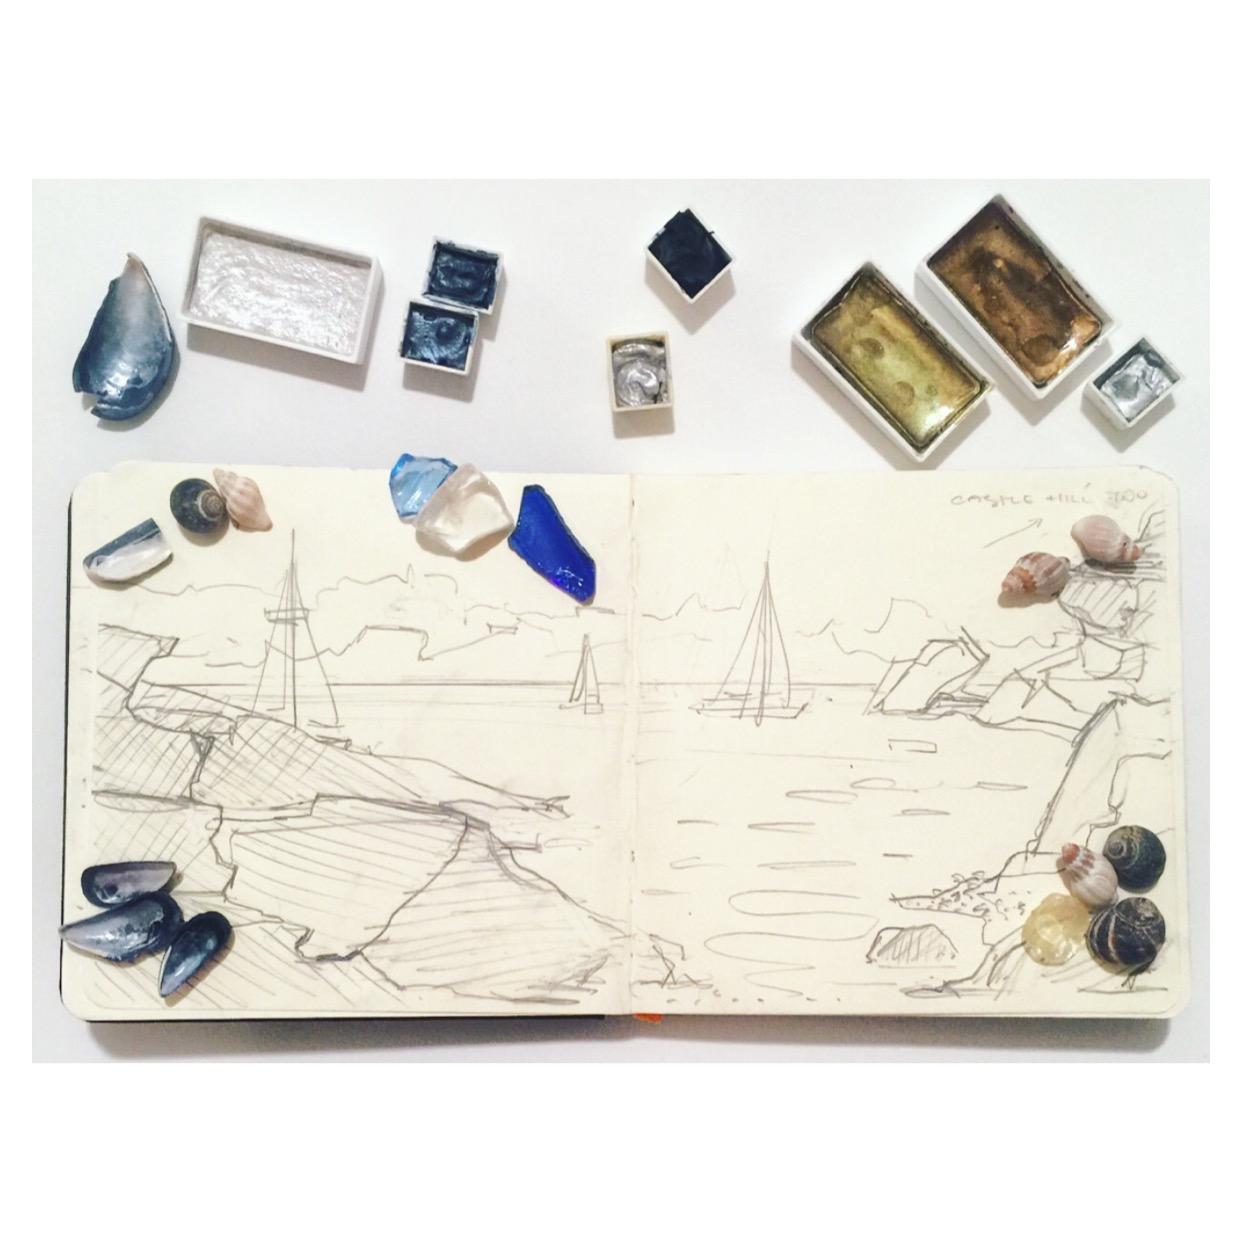 sketchbookandseaglassnewport2016